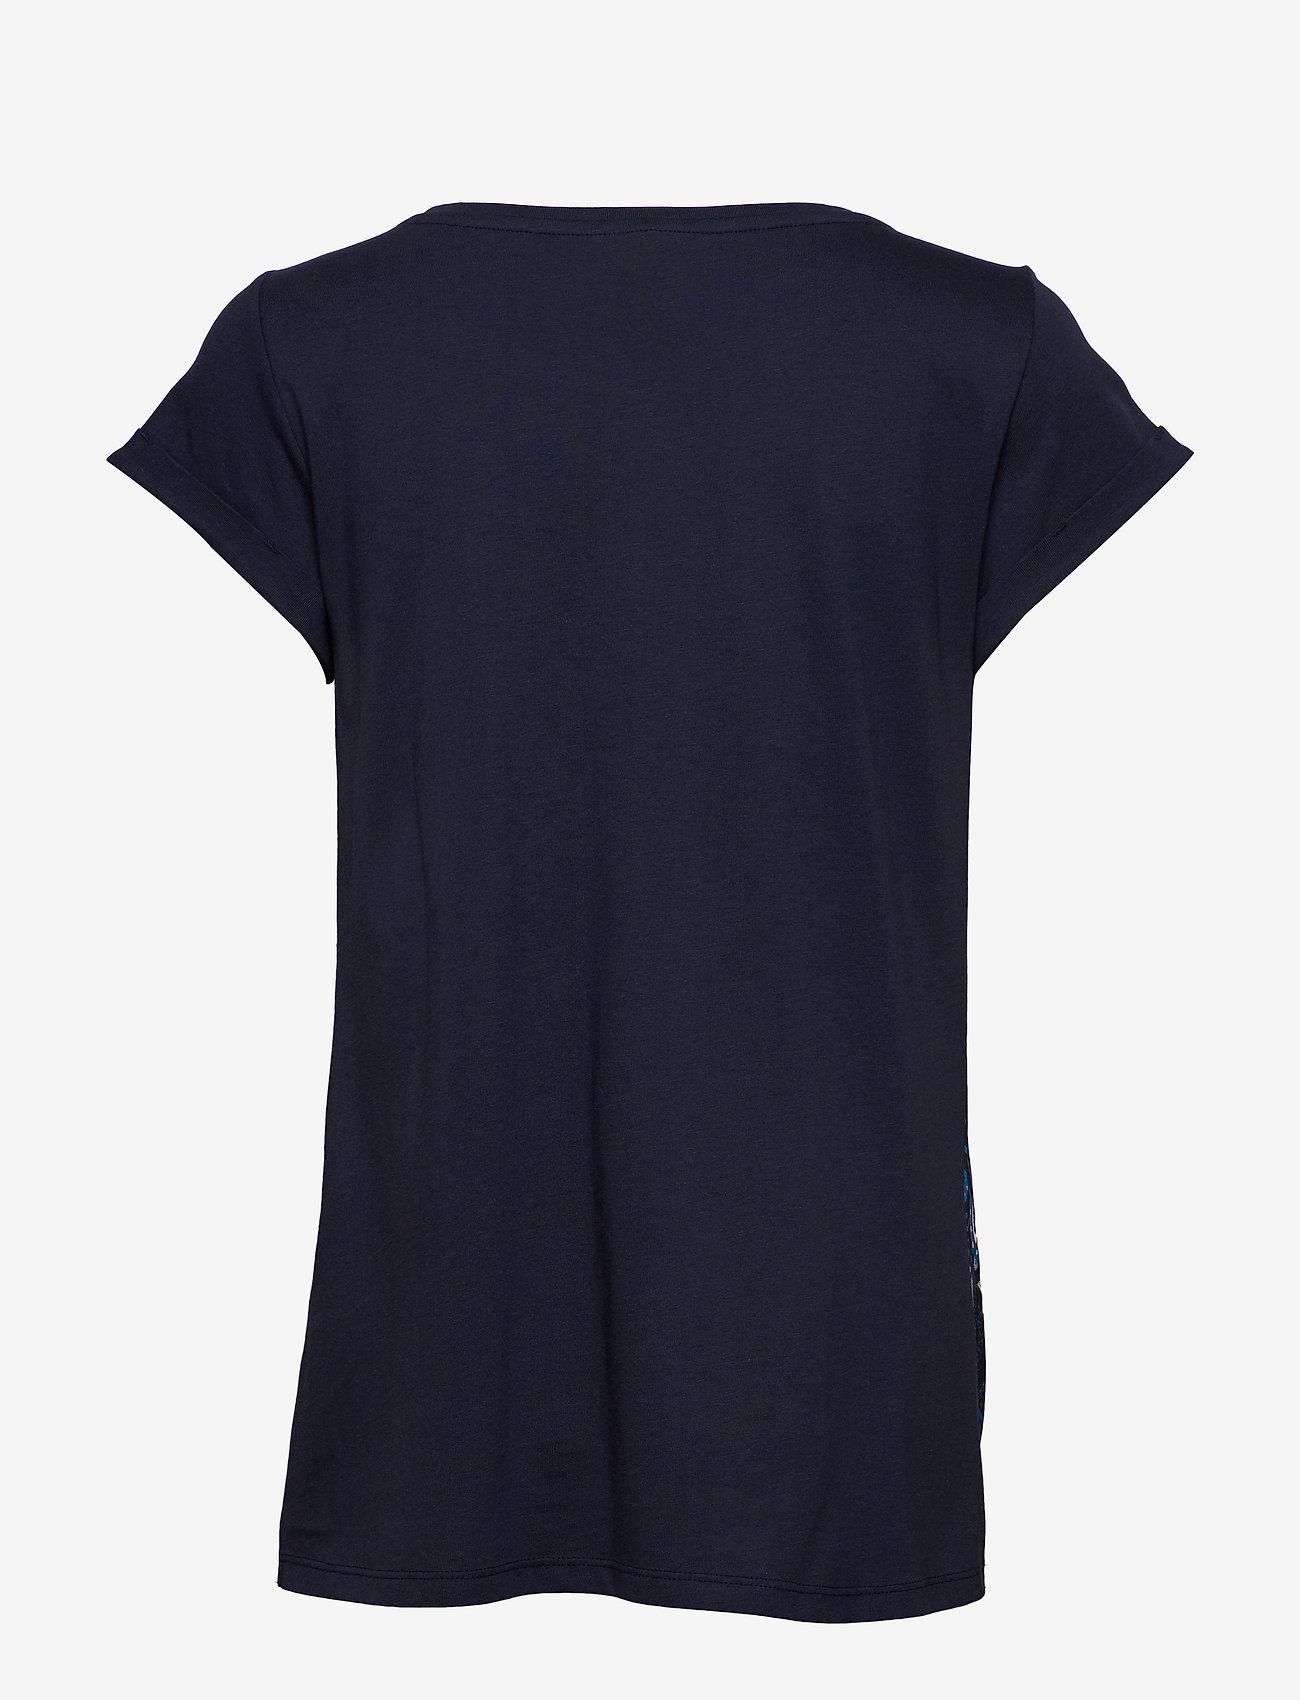 Esprit Casual - T-Shirts - t-shirts - navy 5 - 1